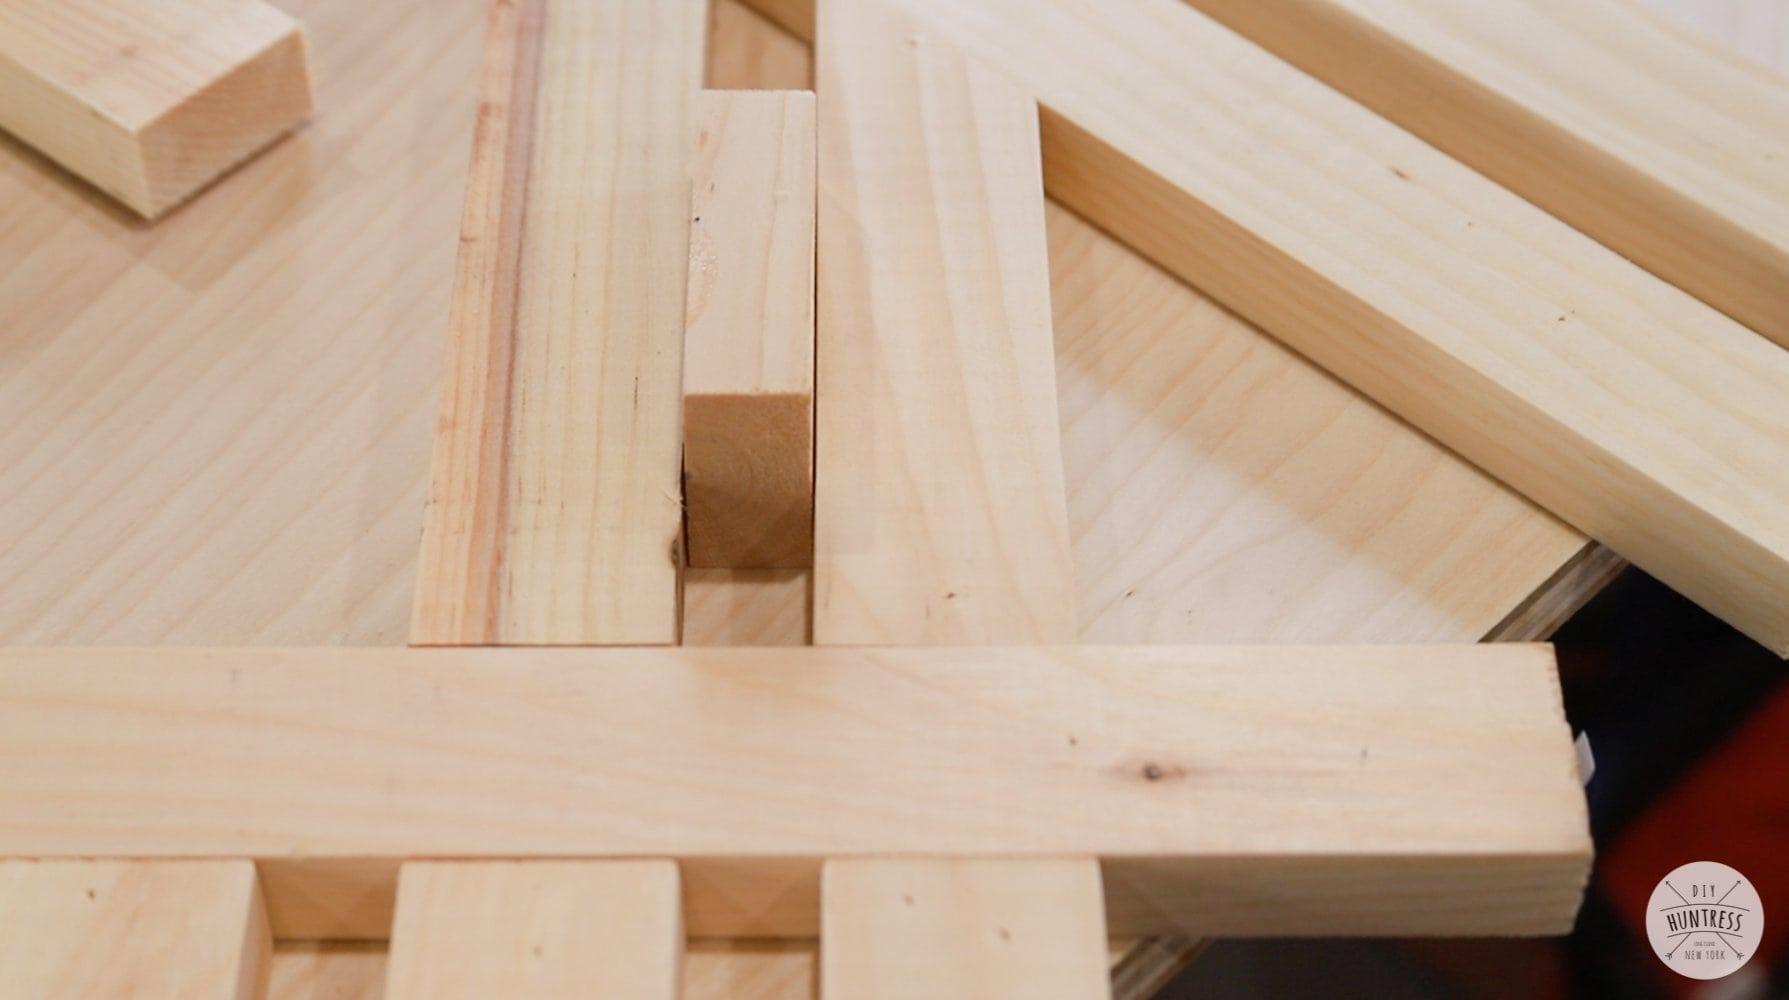 diy wood spacer for art